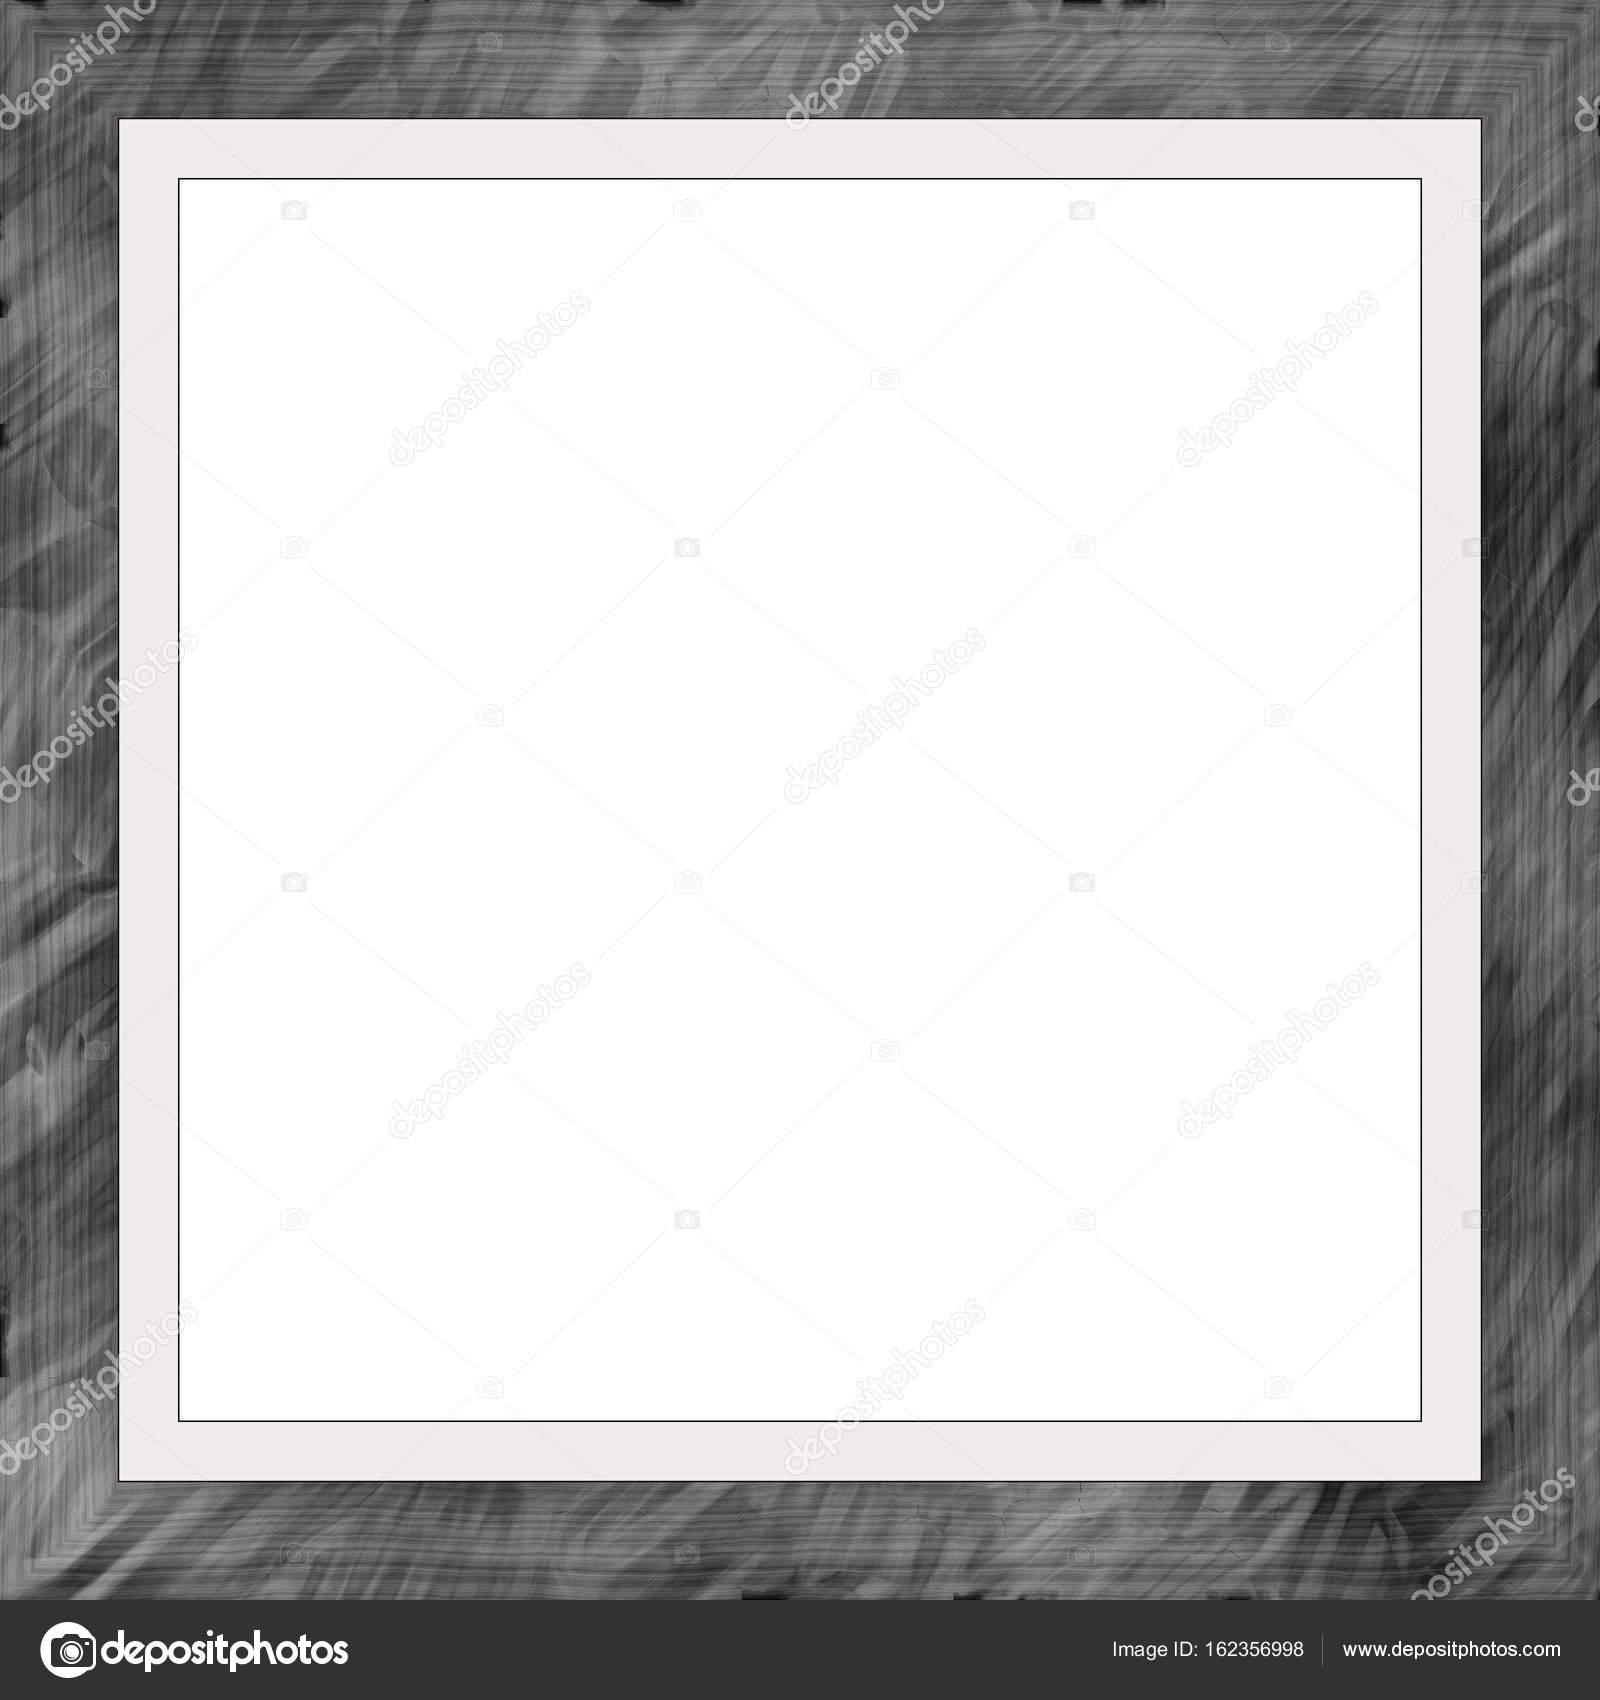 Schwarz verwitterte quadratische Holz Bilderrahmen Gemälde Bild ...